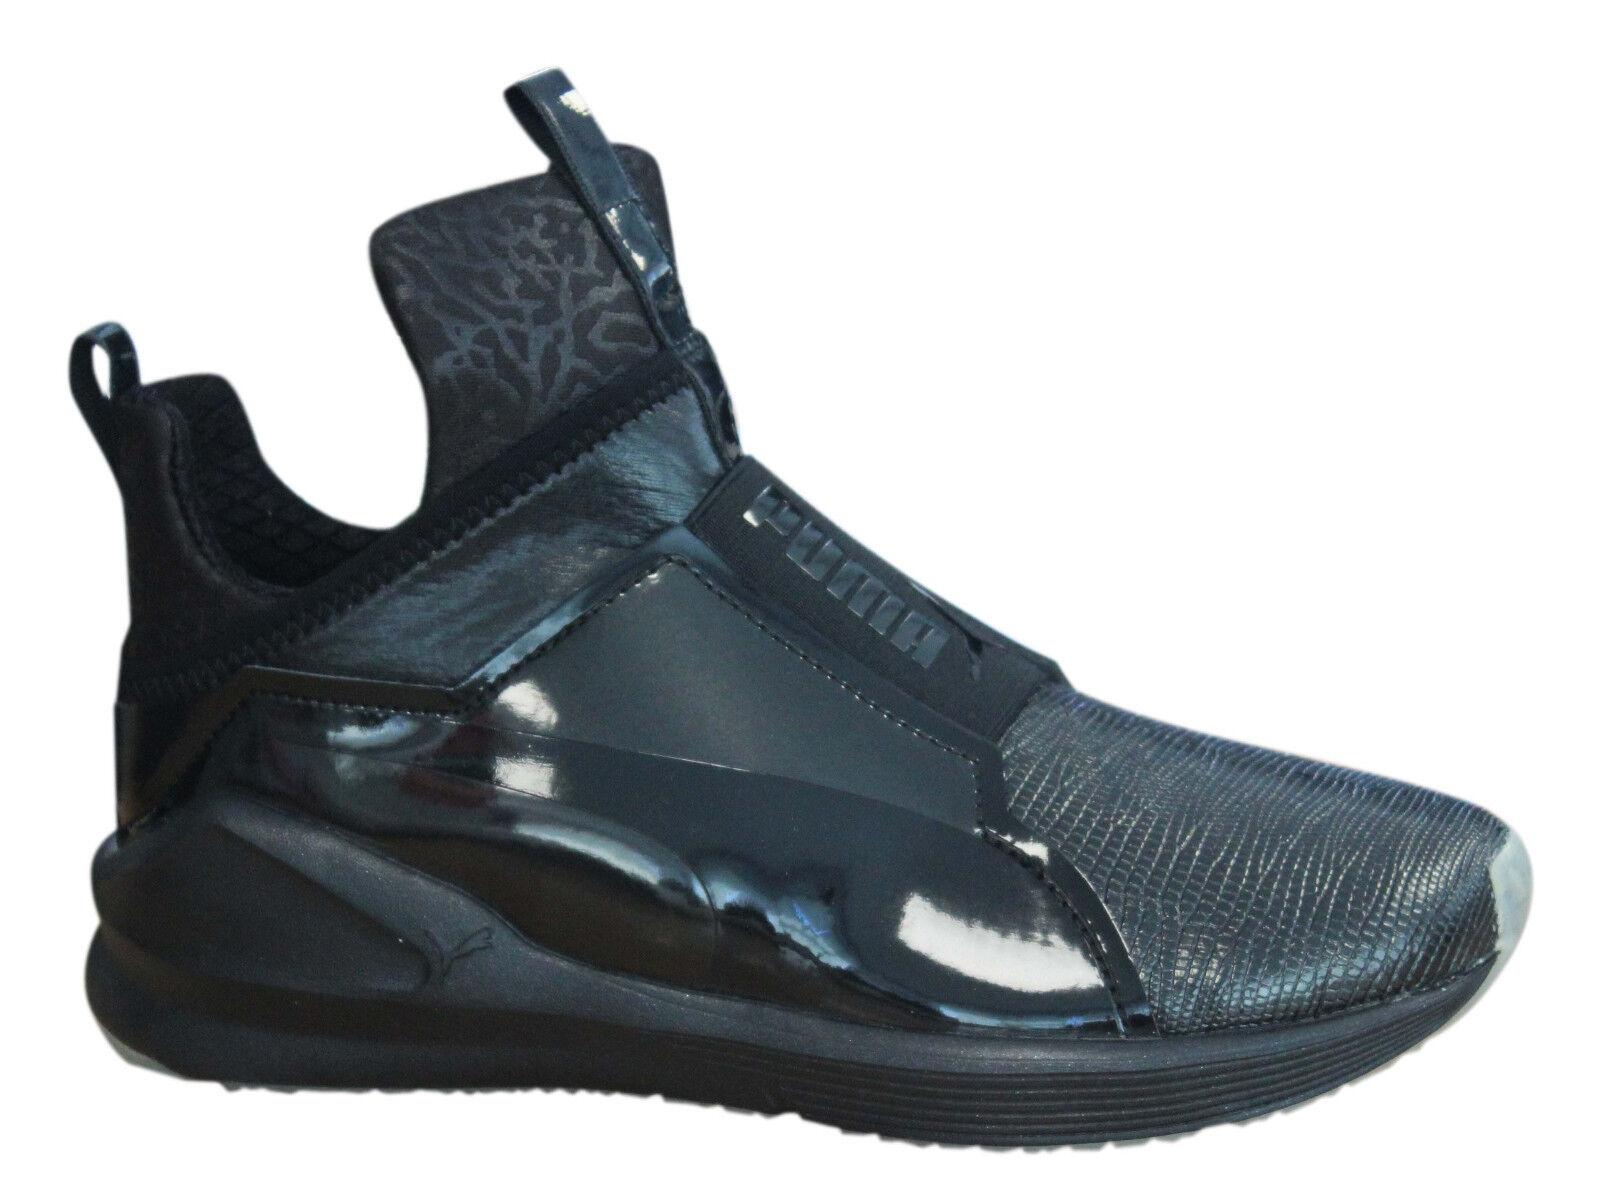 Puma Fierce Metallic Womens Trainers Slip On Mid Shoes Black 189865 03 OppM5